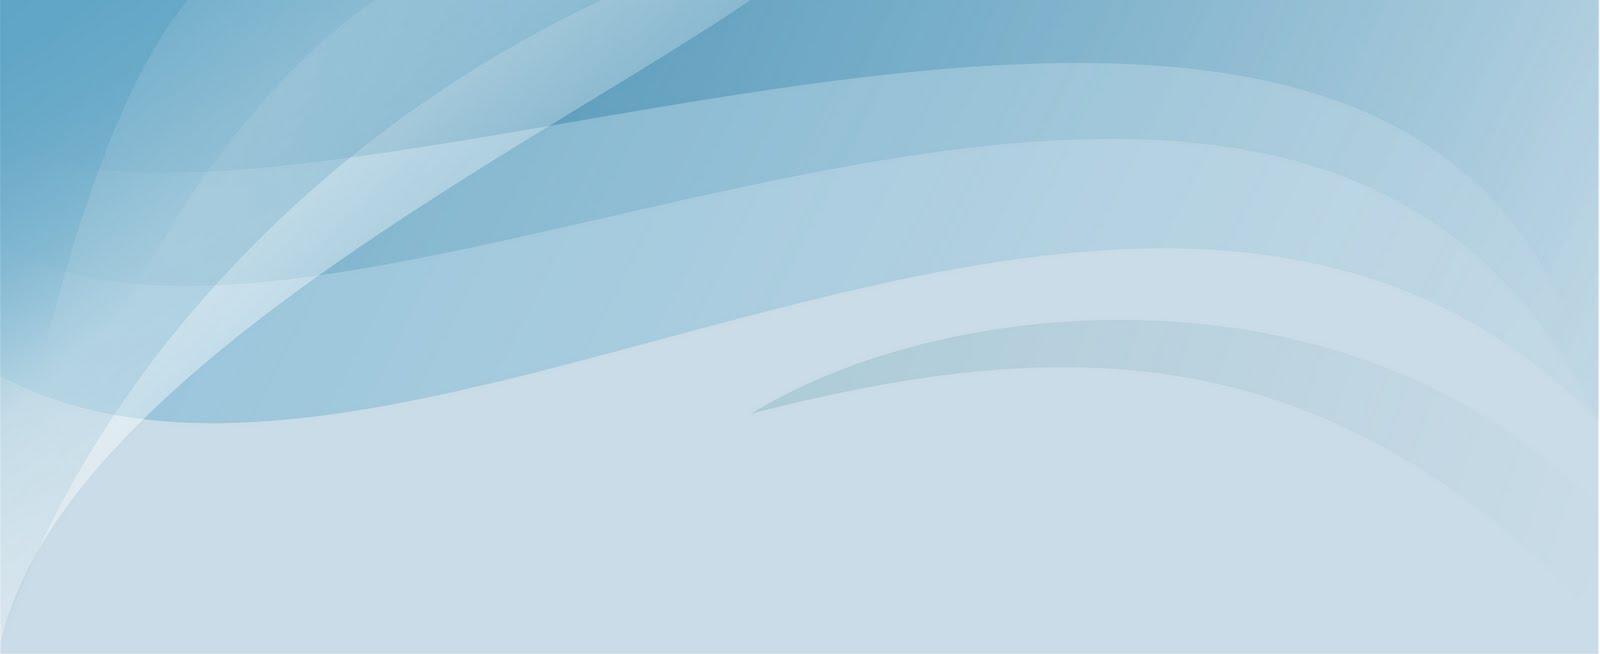 Fondo Celeste | New Calendar Template Site